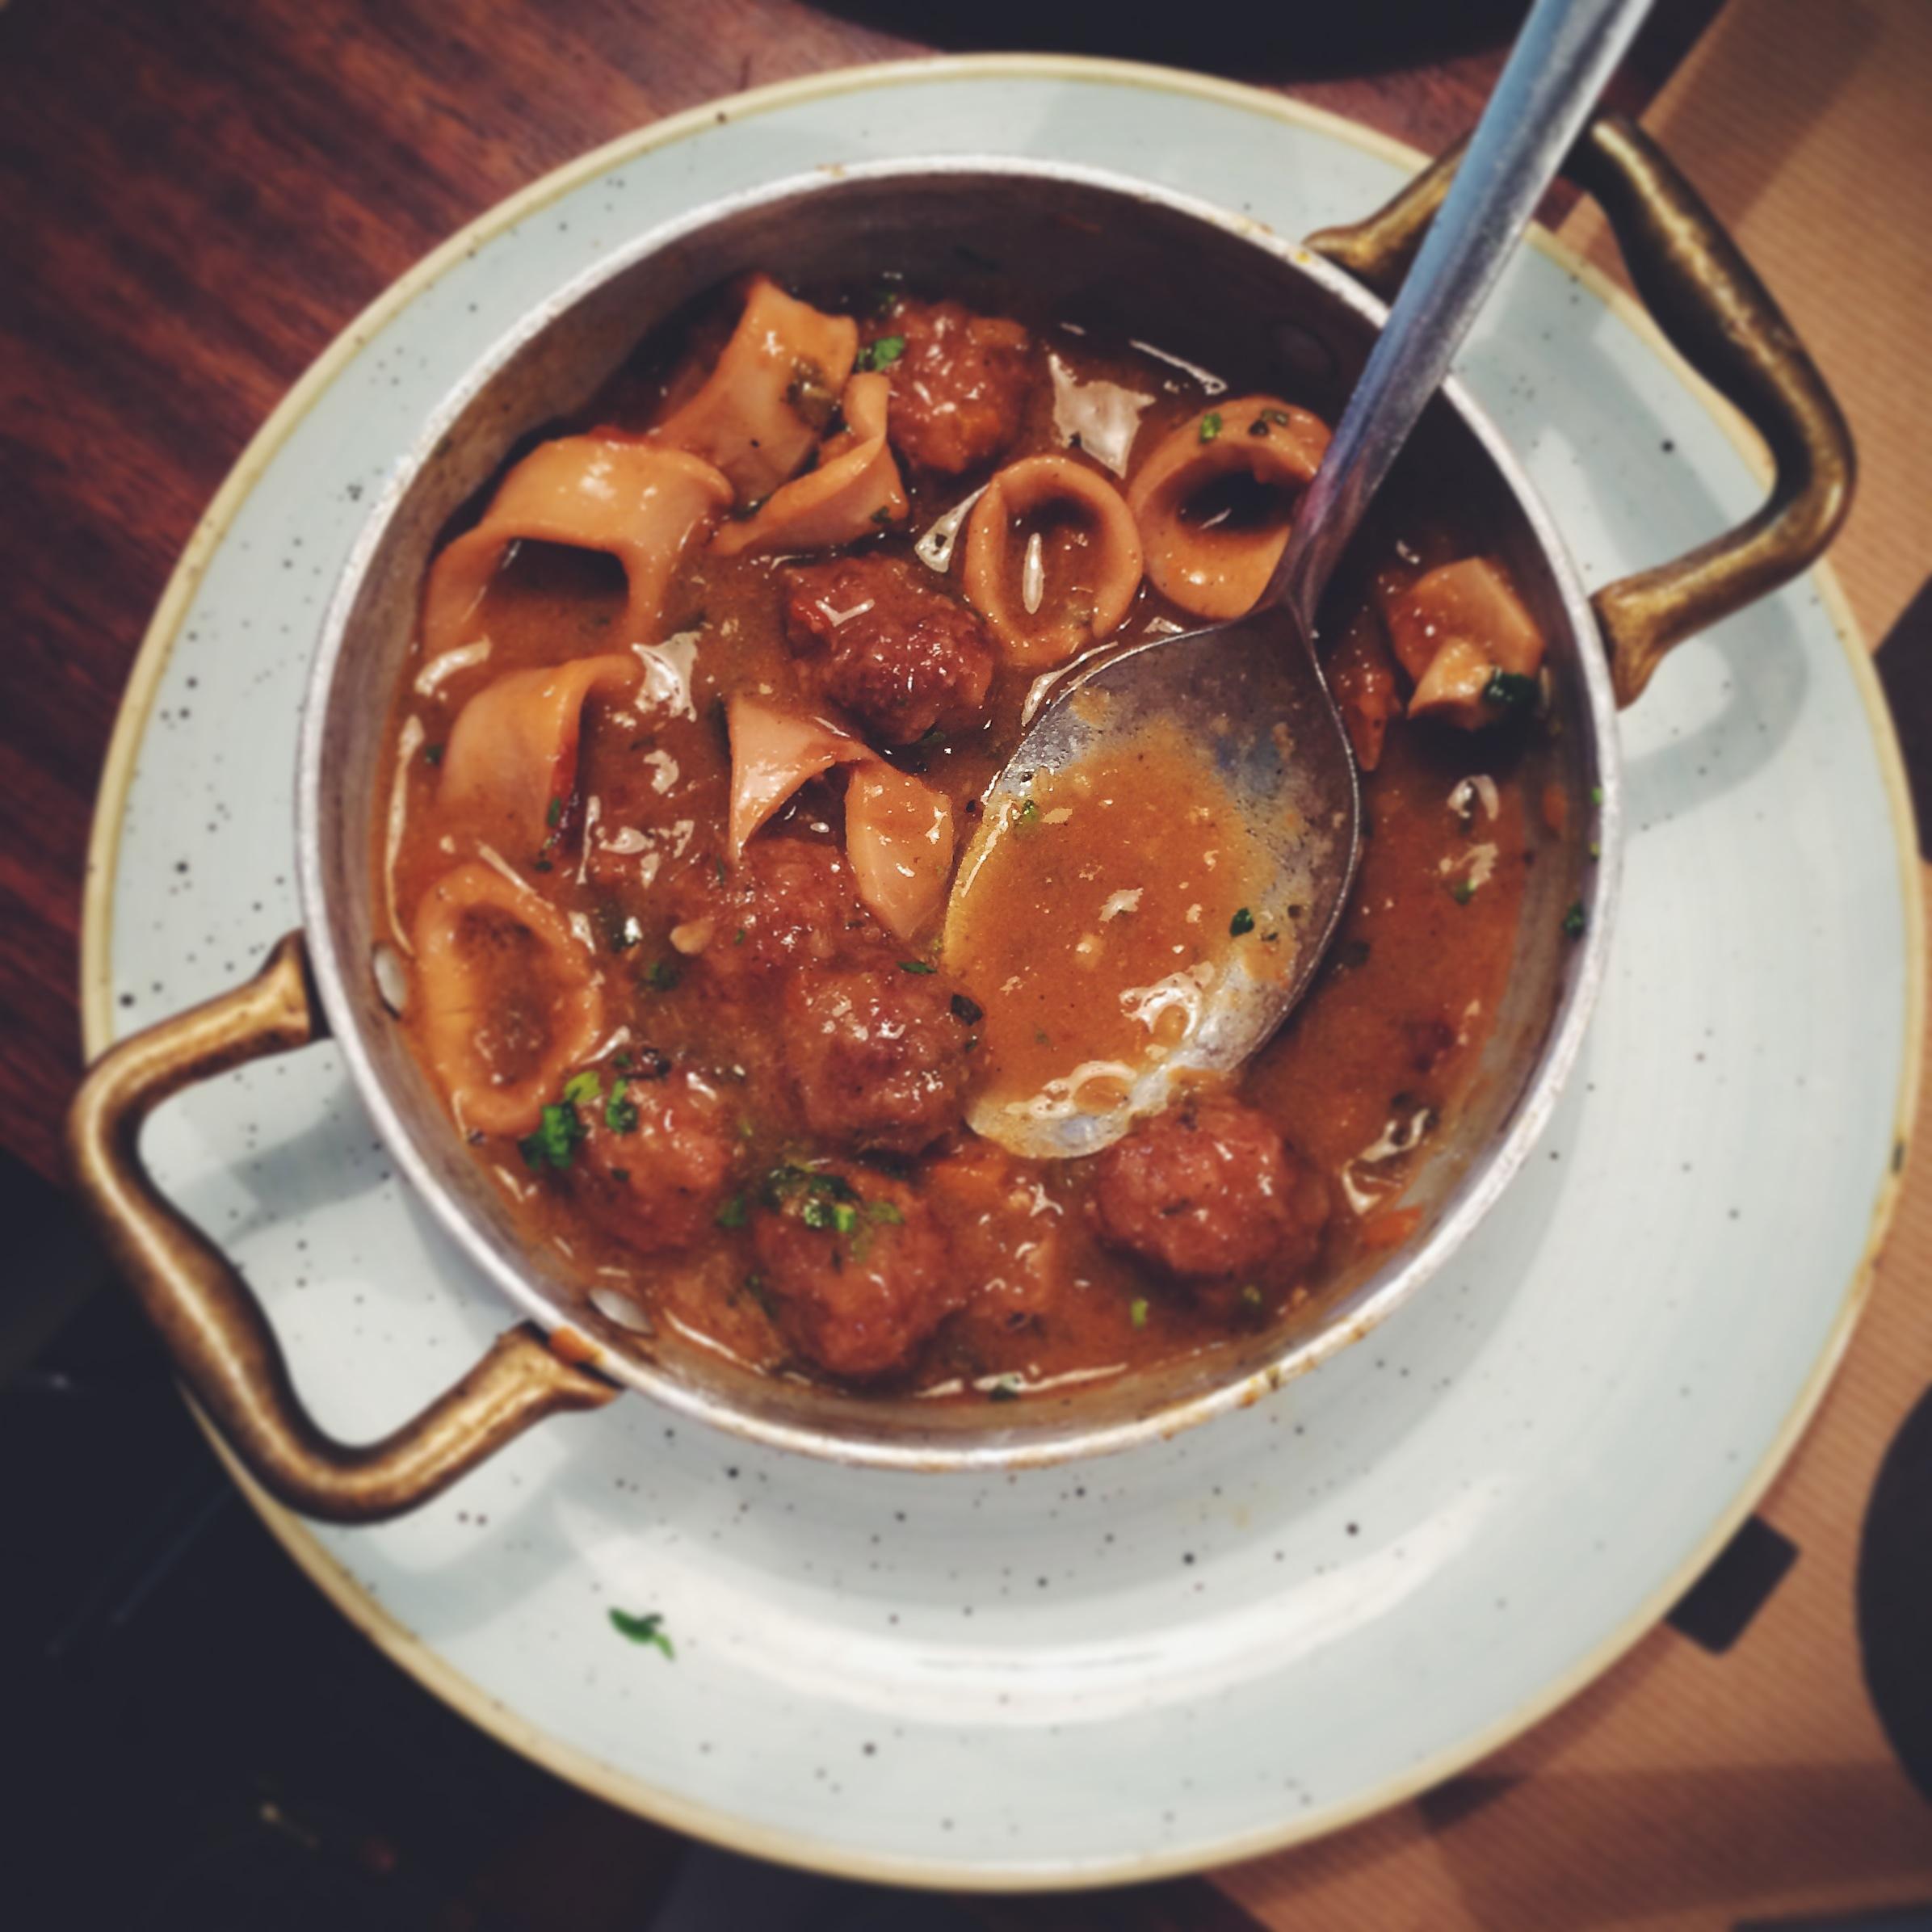 Meatballs with squid at Bar Lobo Barcelona